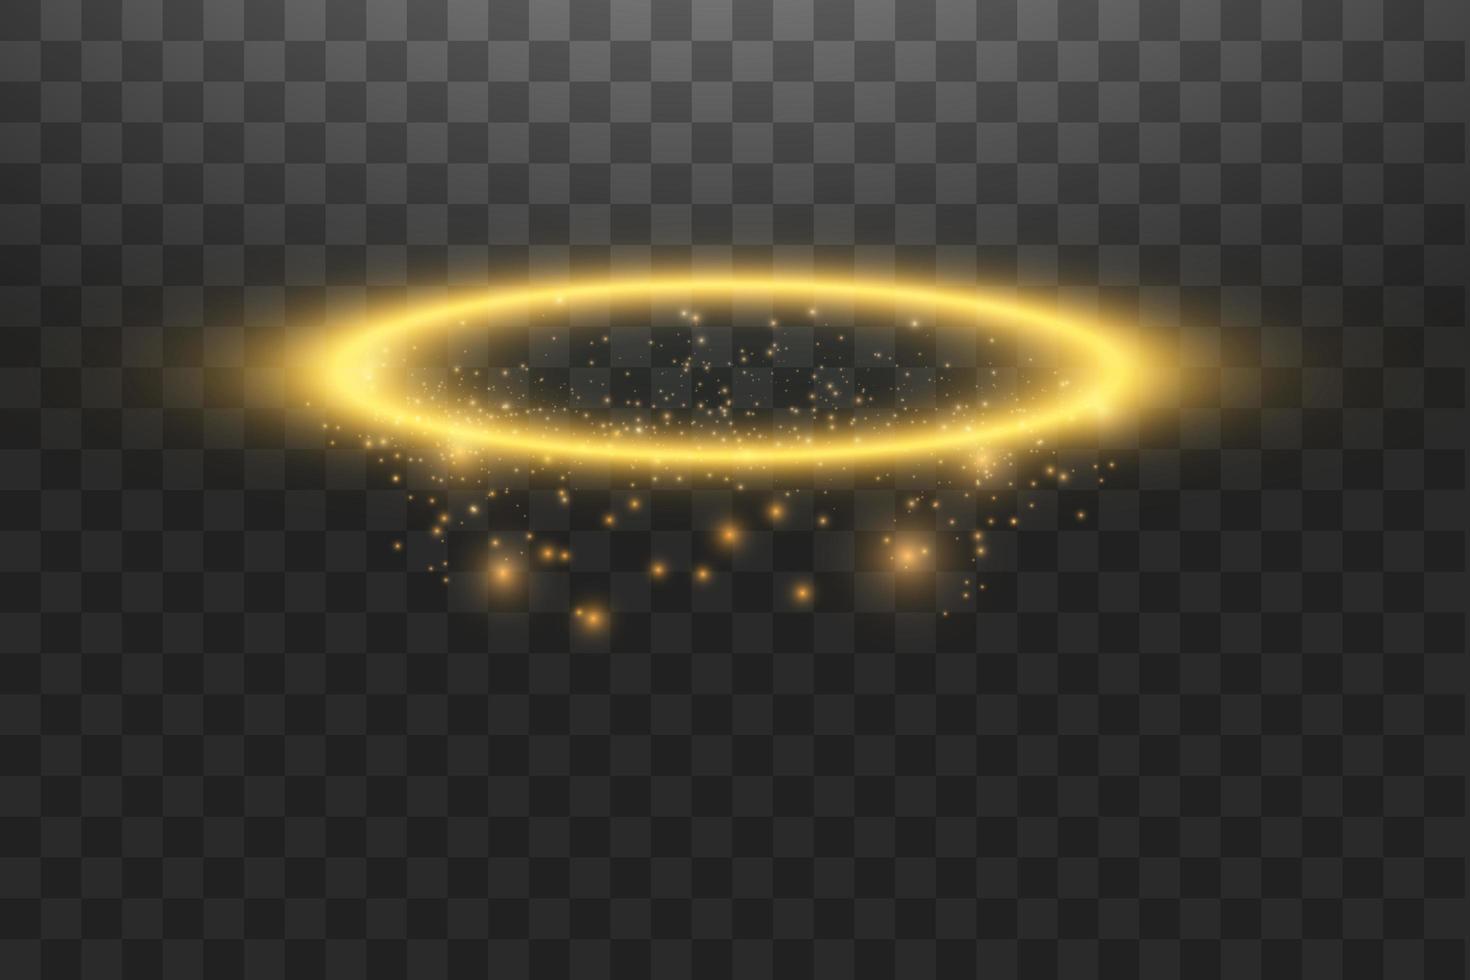 anello angelo aureola in oro vettore